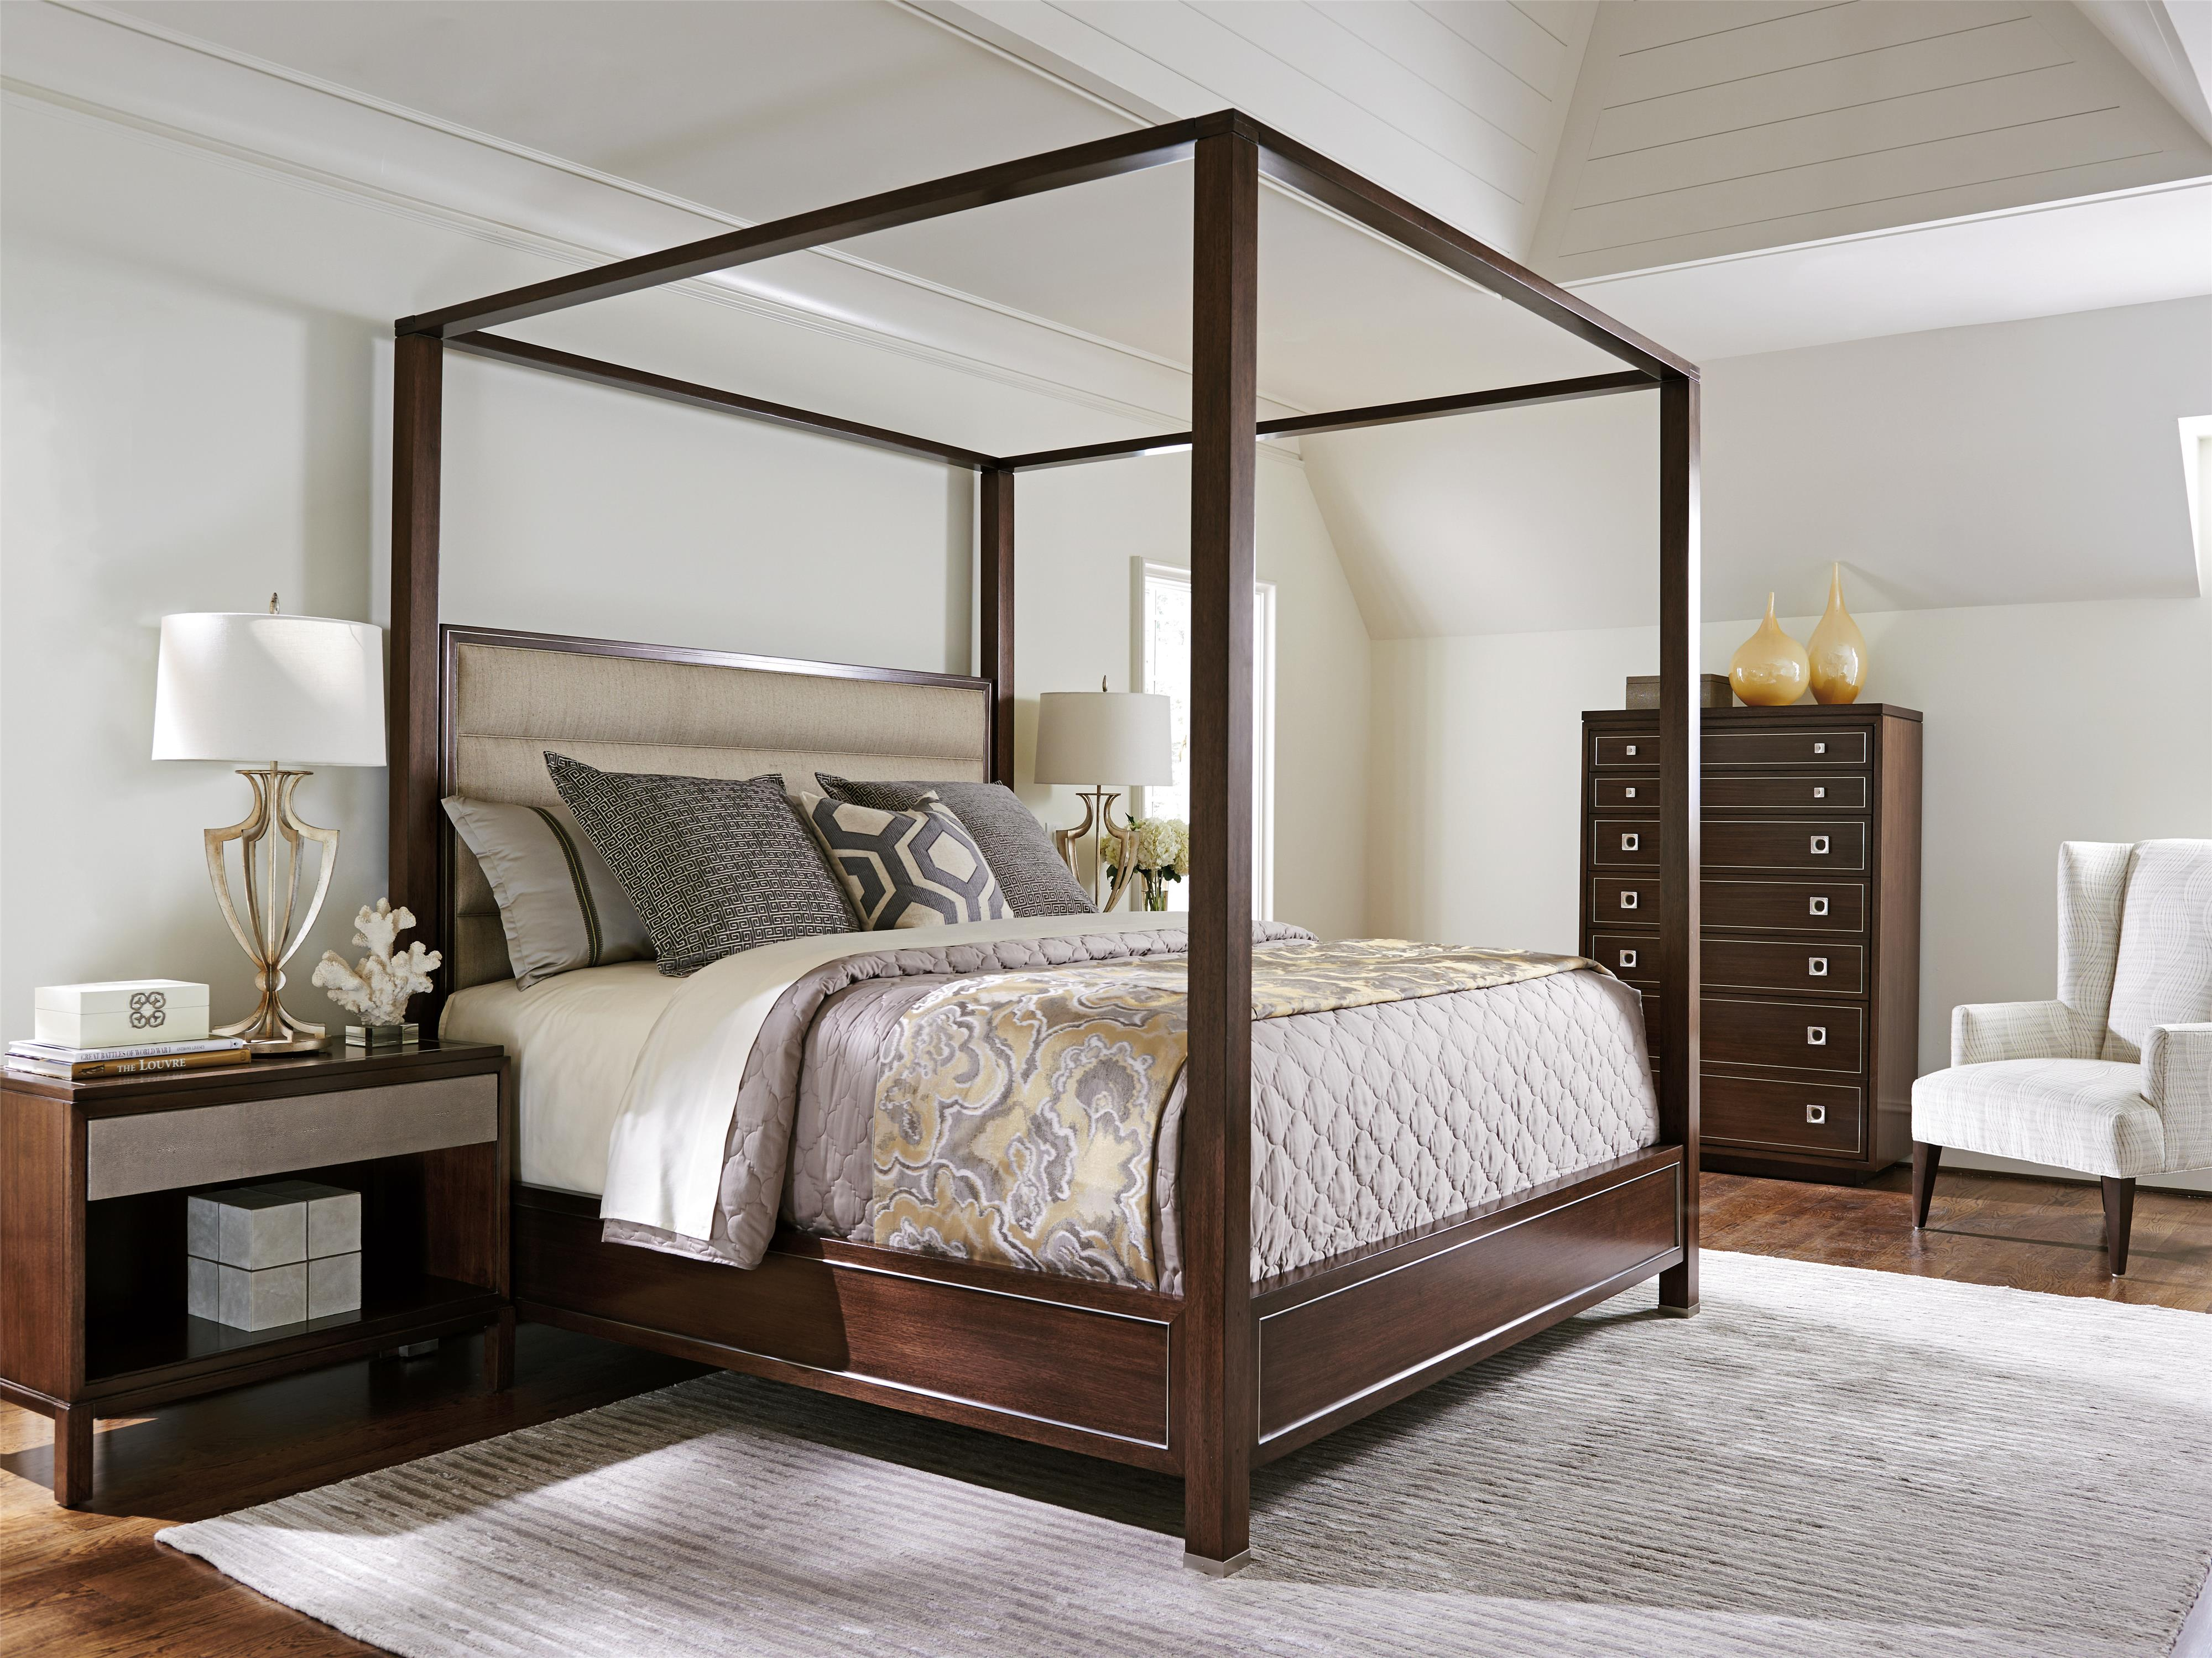 sophisticated lexington bedroom furniture. MacArthur Park (upholstery) By Lexington - C. S. Wo \u0026 Sons Hawaii Dealer Sophisticated Bedroom Furniture